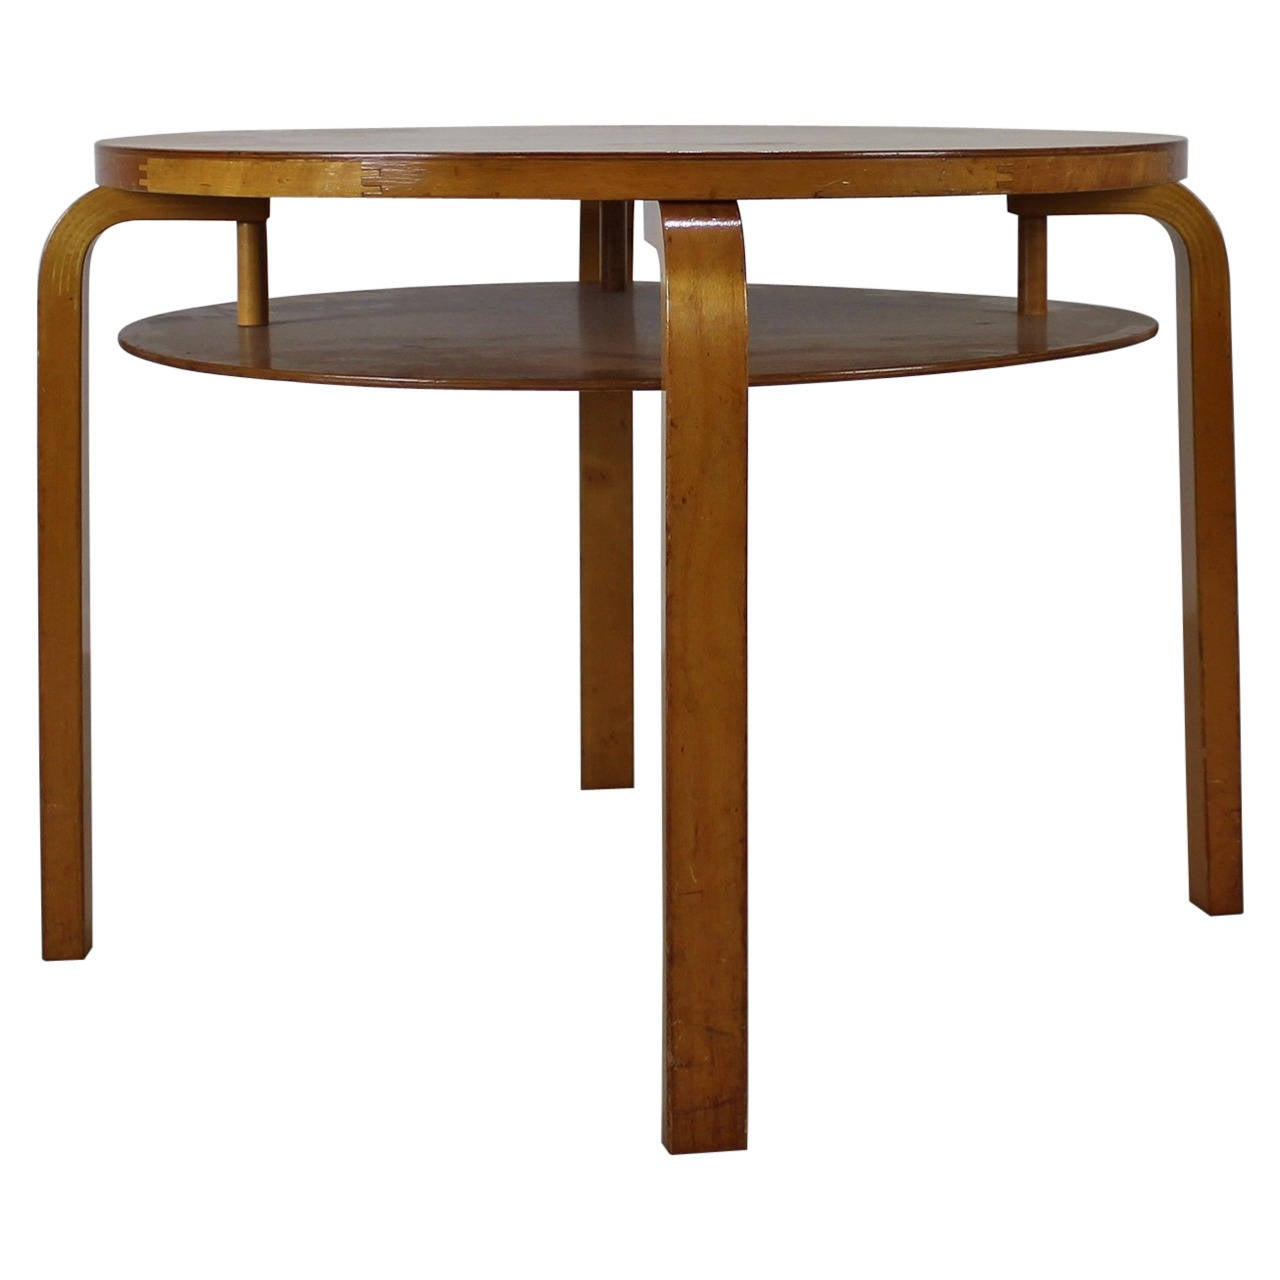 birchwood lacquered alvar aalto table no 70 at 1stdibs. Black Bedroom Furniture Sets. Home Design Ideas